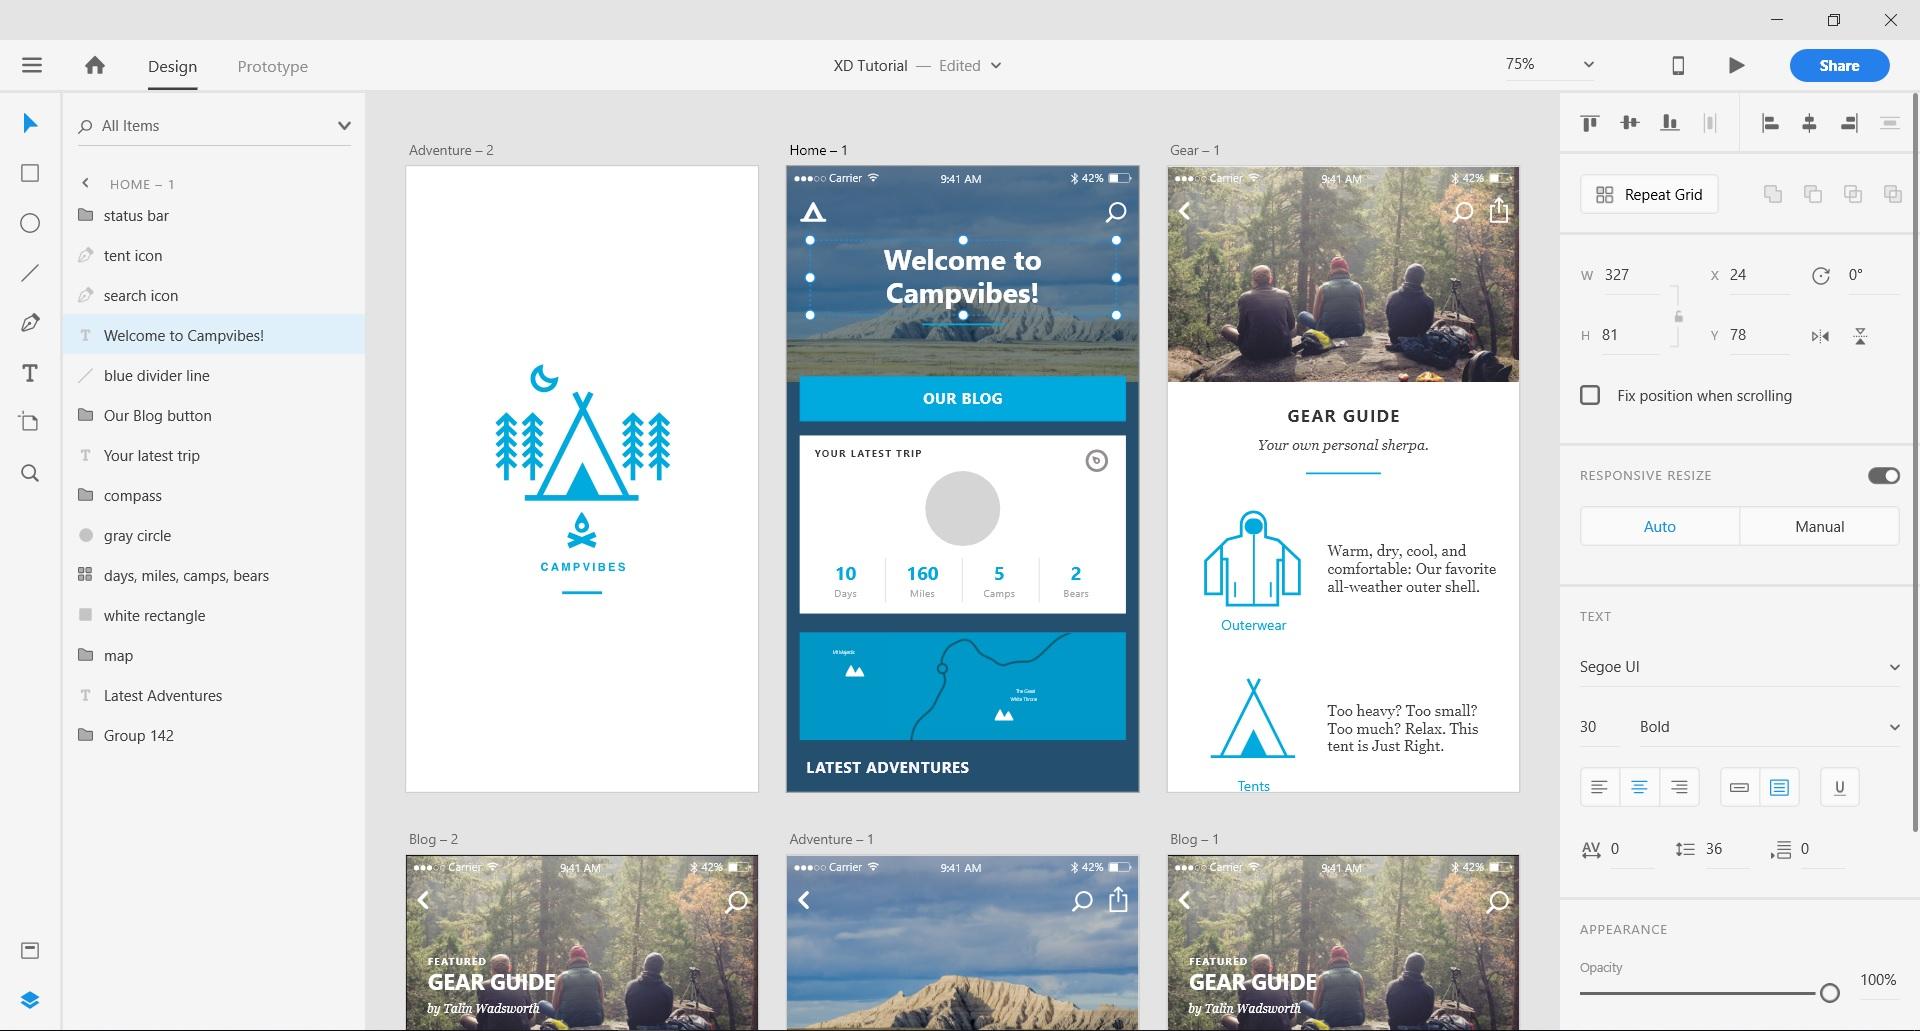 Adobe user interface